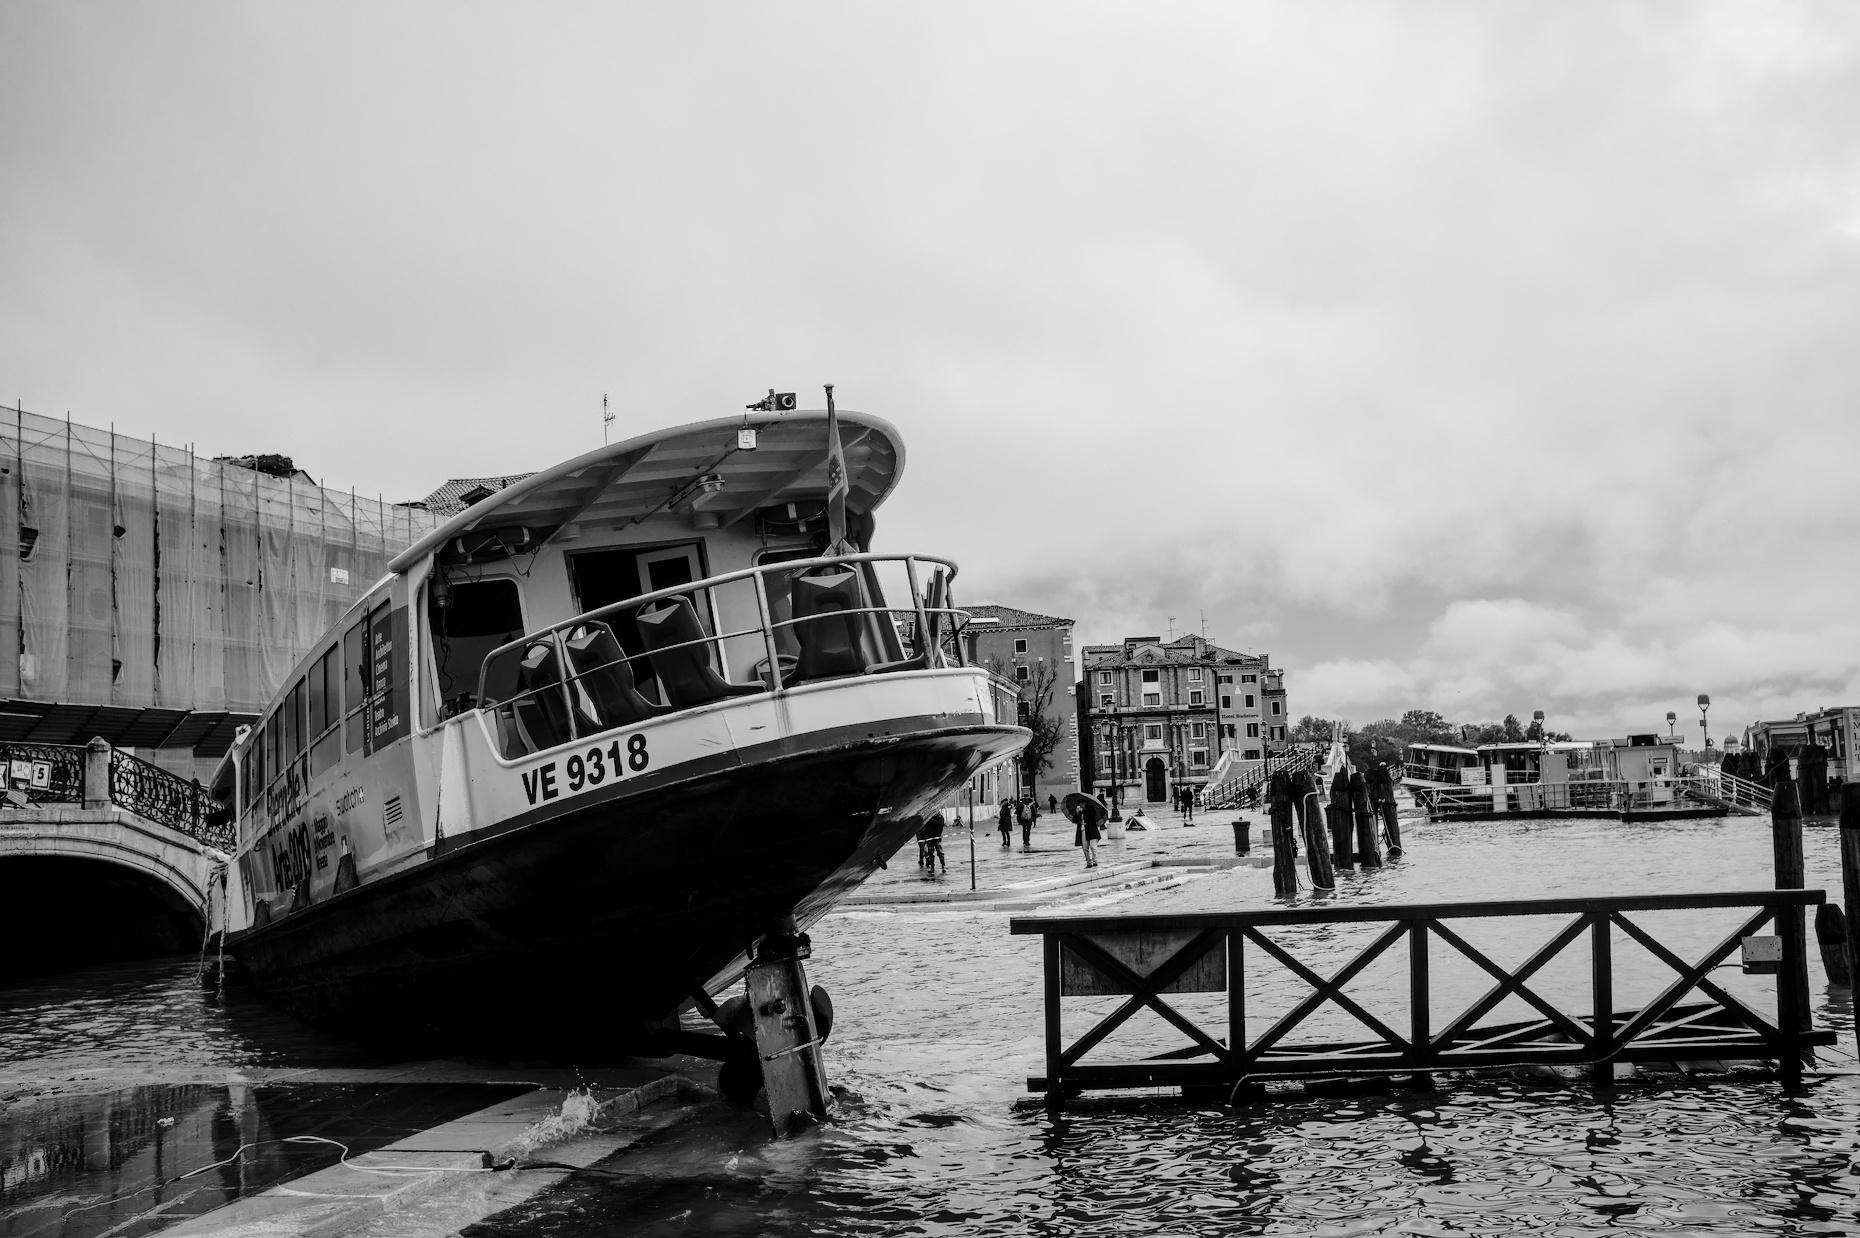 High tide - Venice under water - wrecked vaporetto